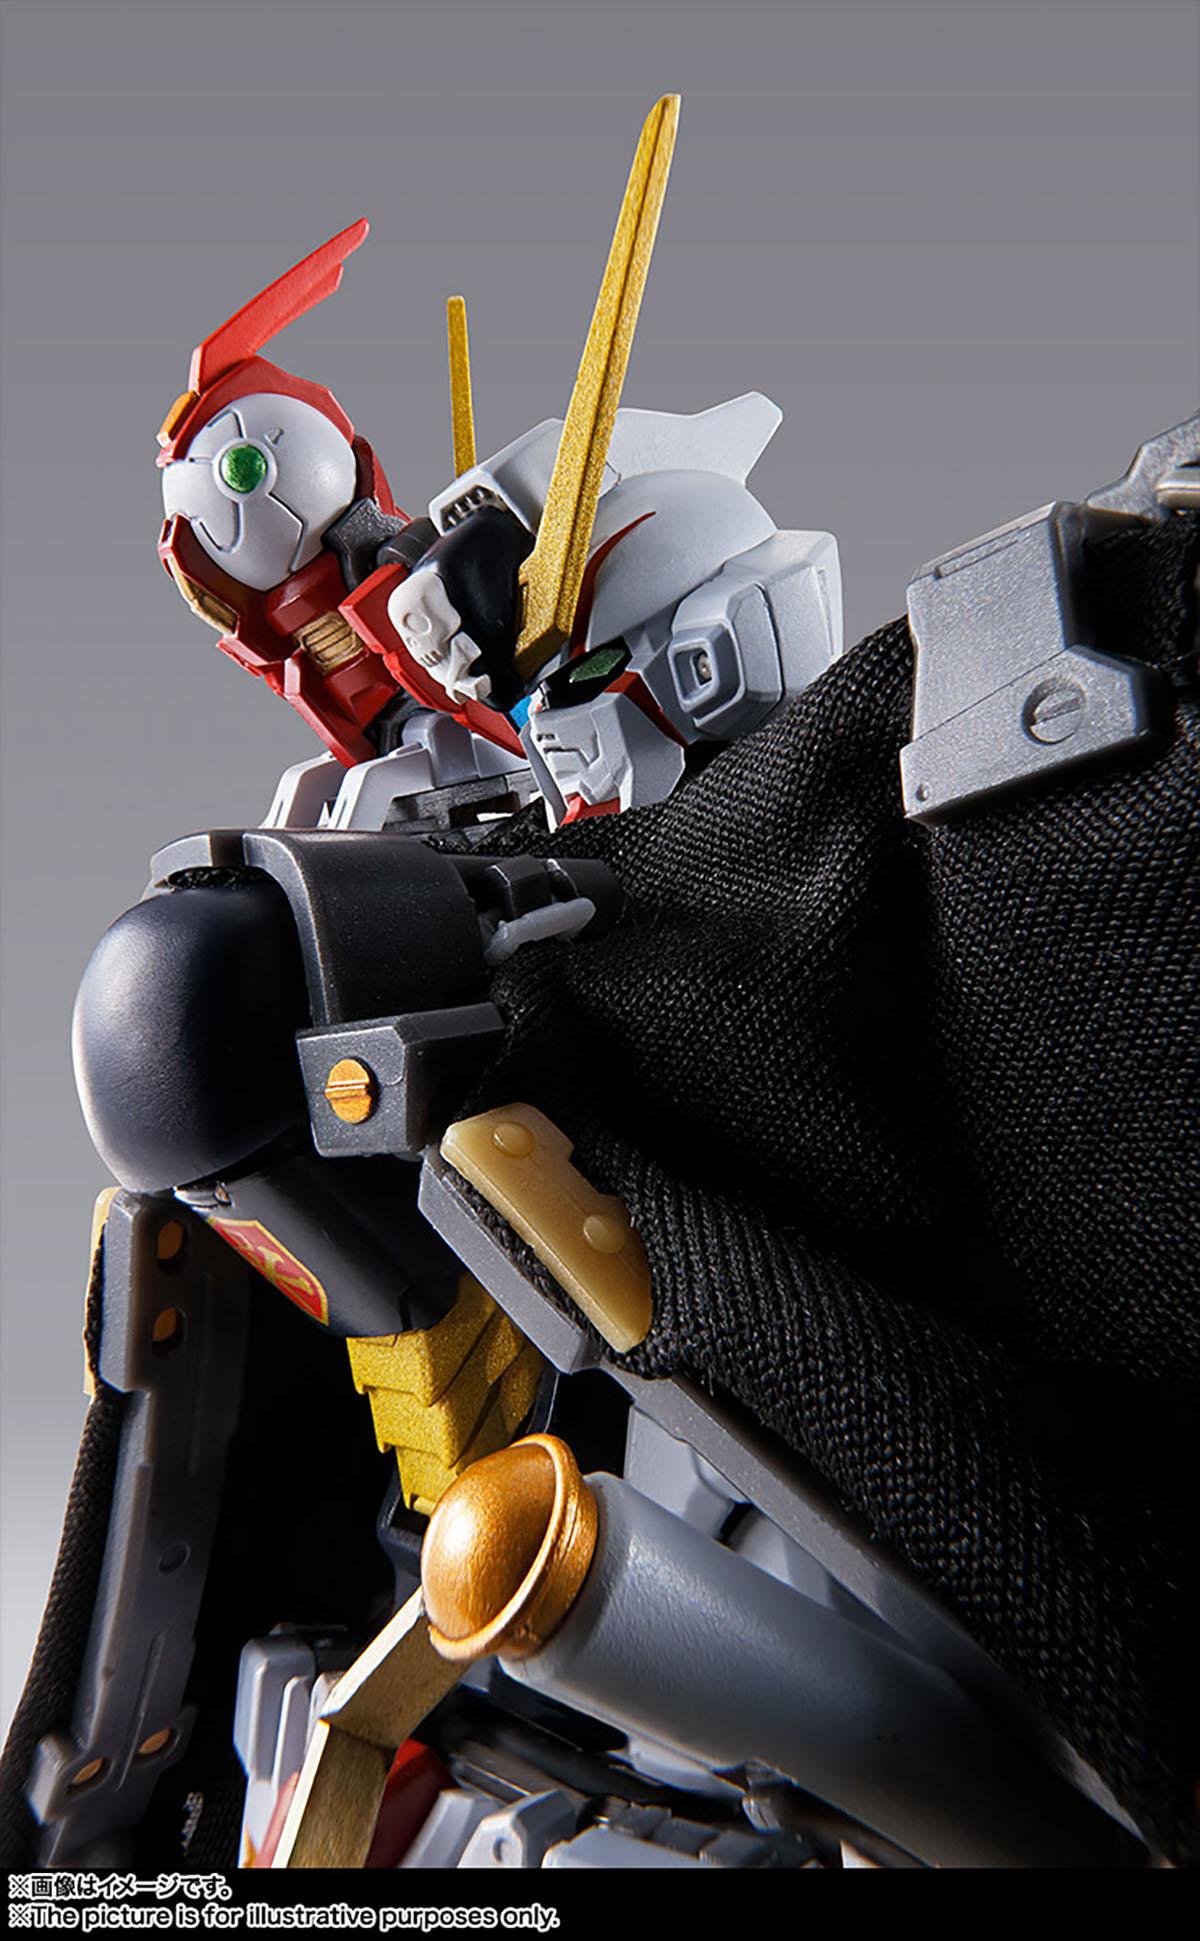 METAL BUILD『クロスボーン・ガンダムX1』機動戦士クロスボーン・ガンダム 可動フィギュア-014